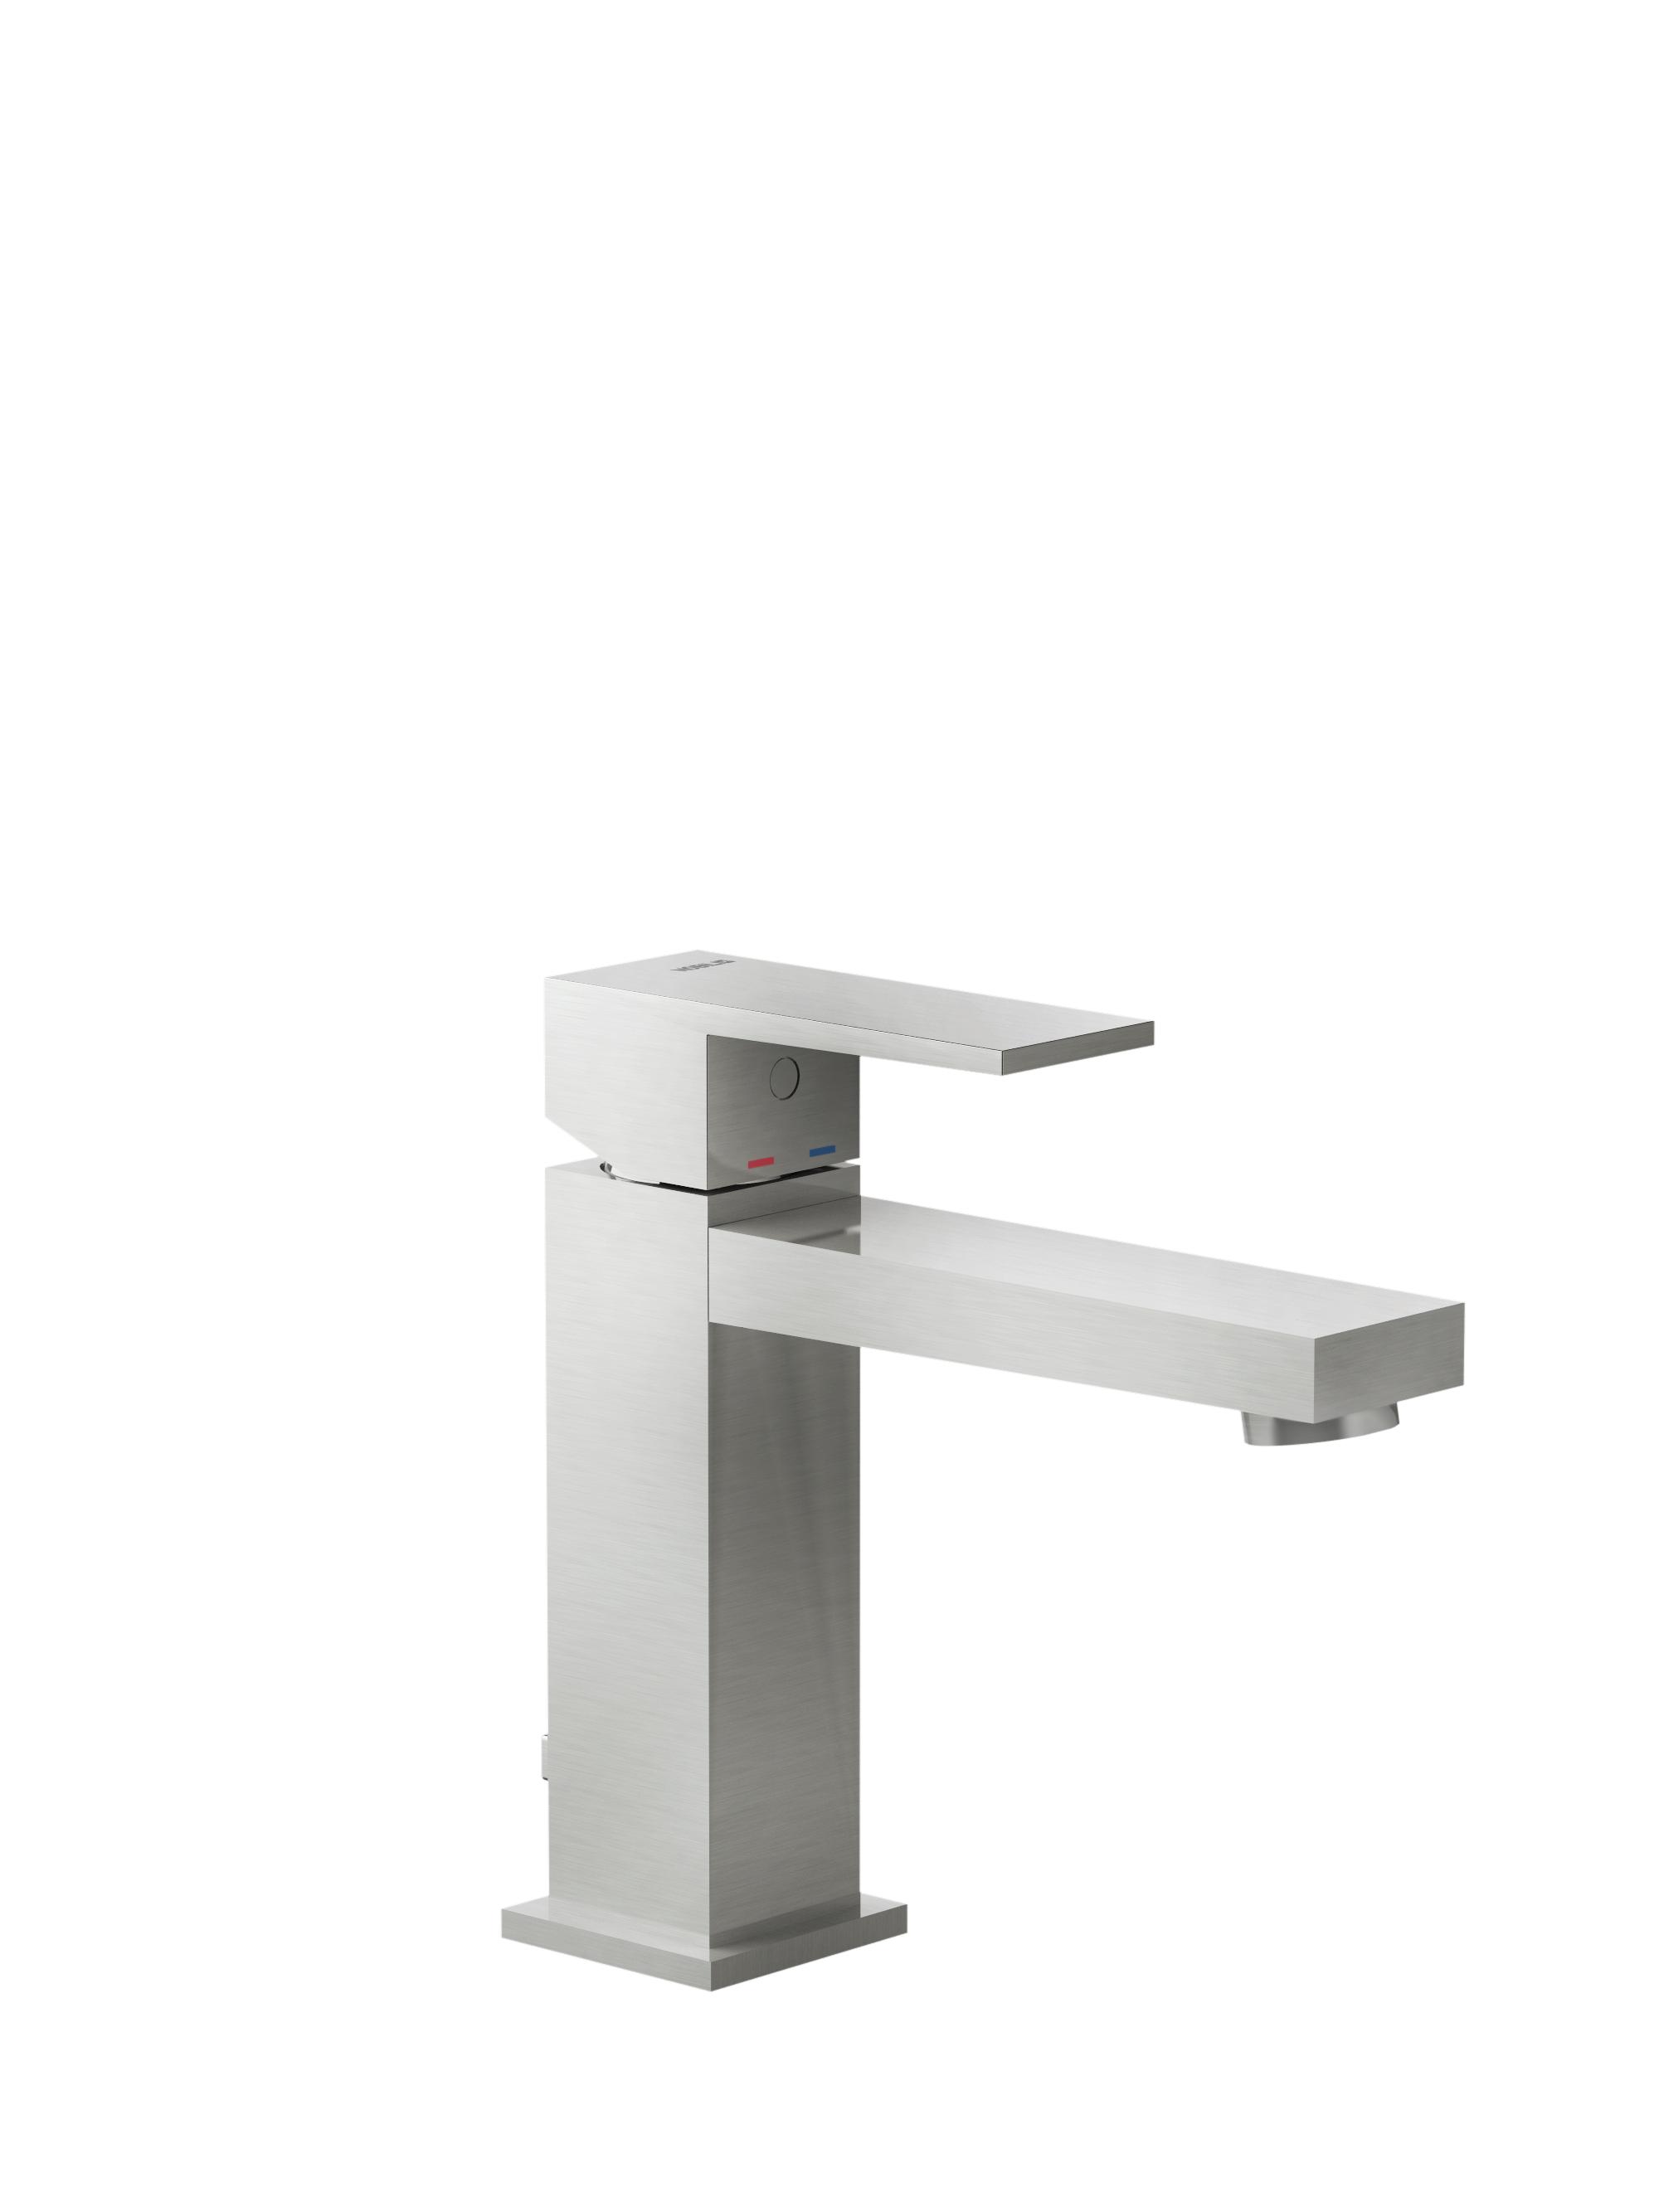 Nobili rubinetterie ha presentato all ish la nuova finitura in nickel spazzolato - Nobili rubinetterie bagno ...